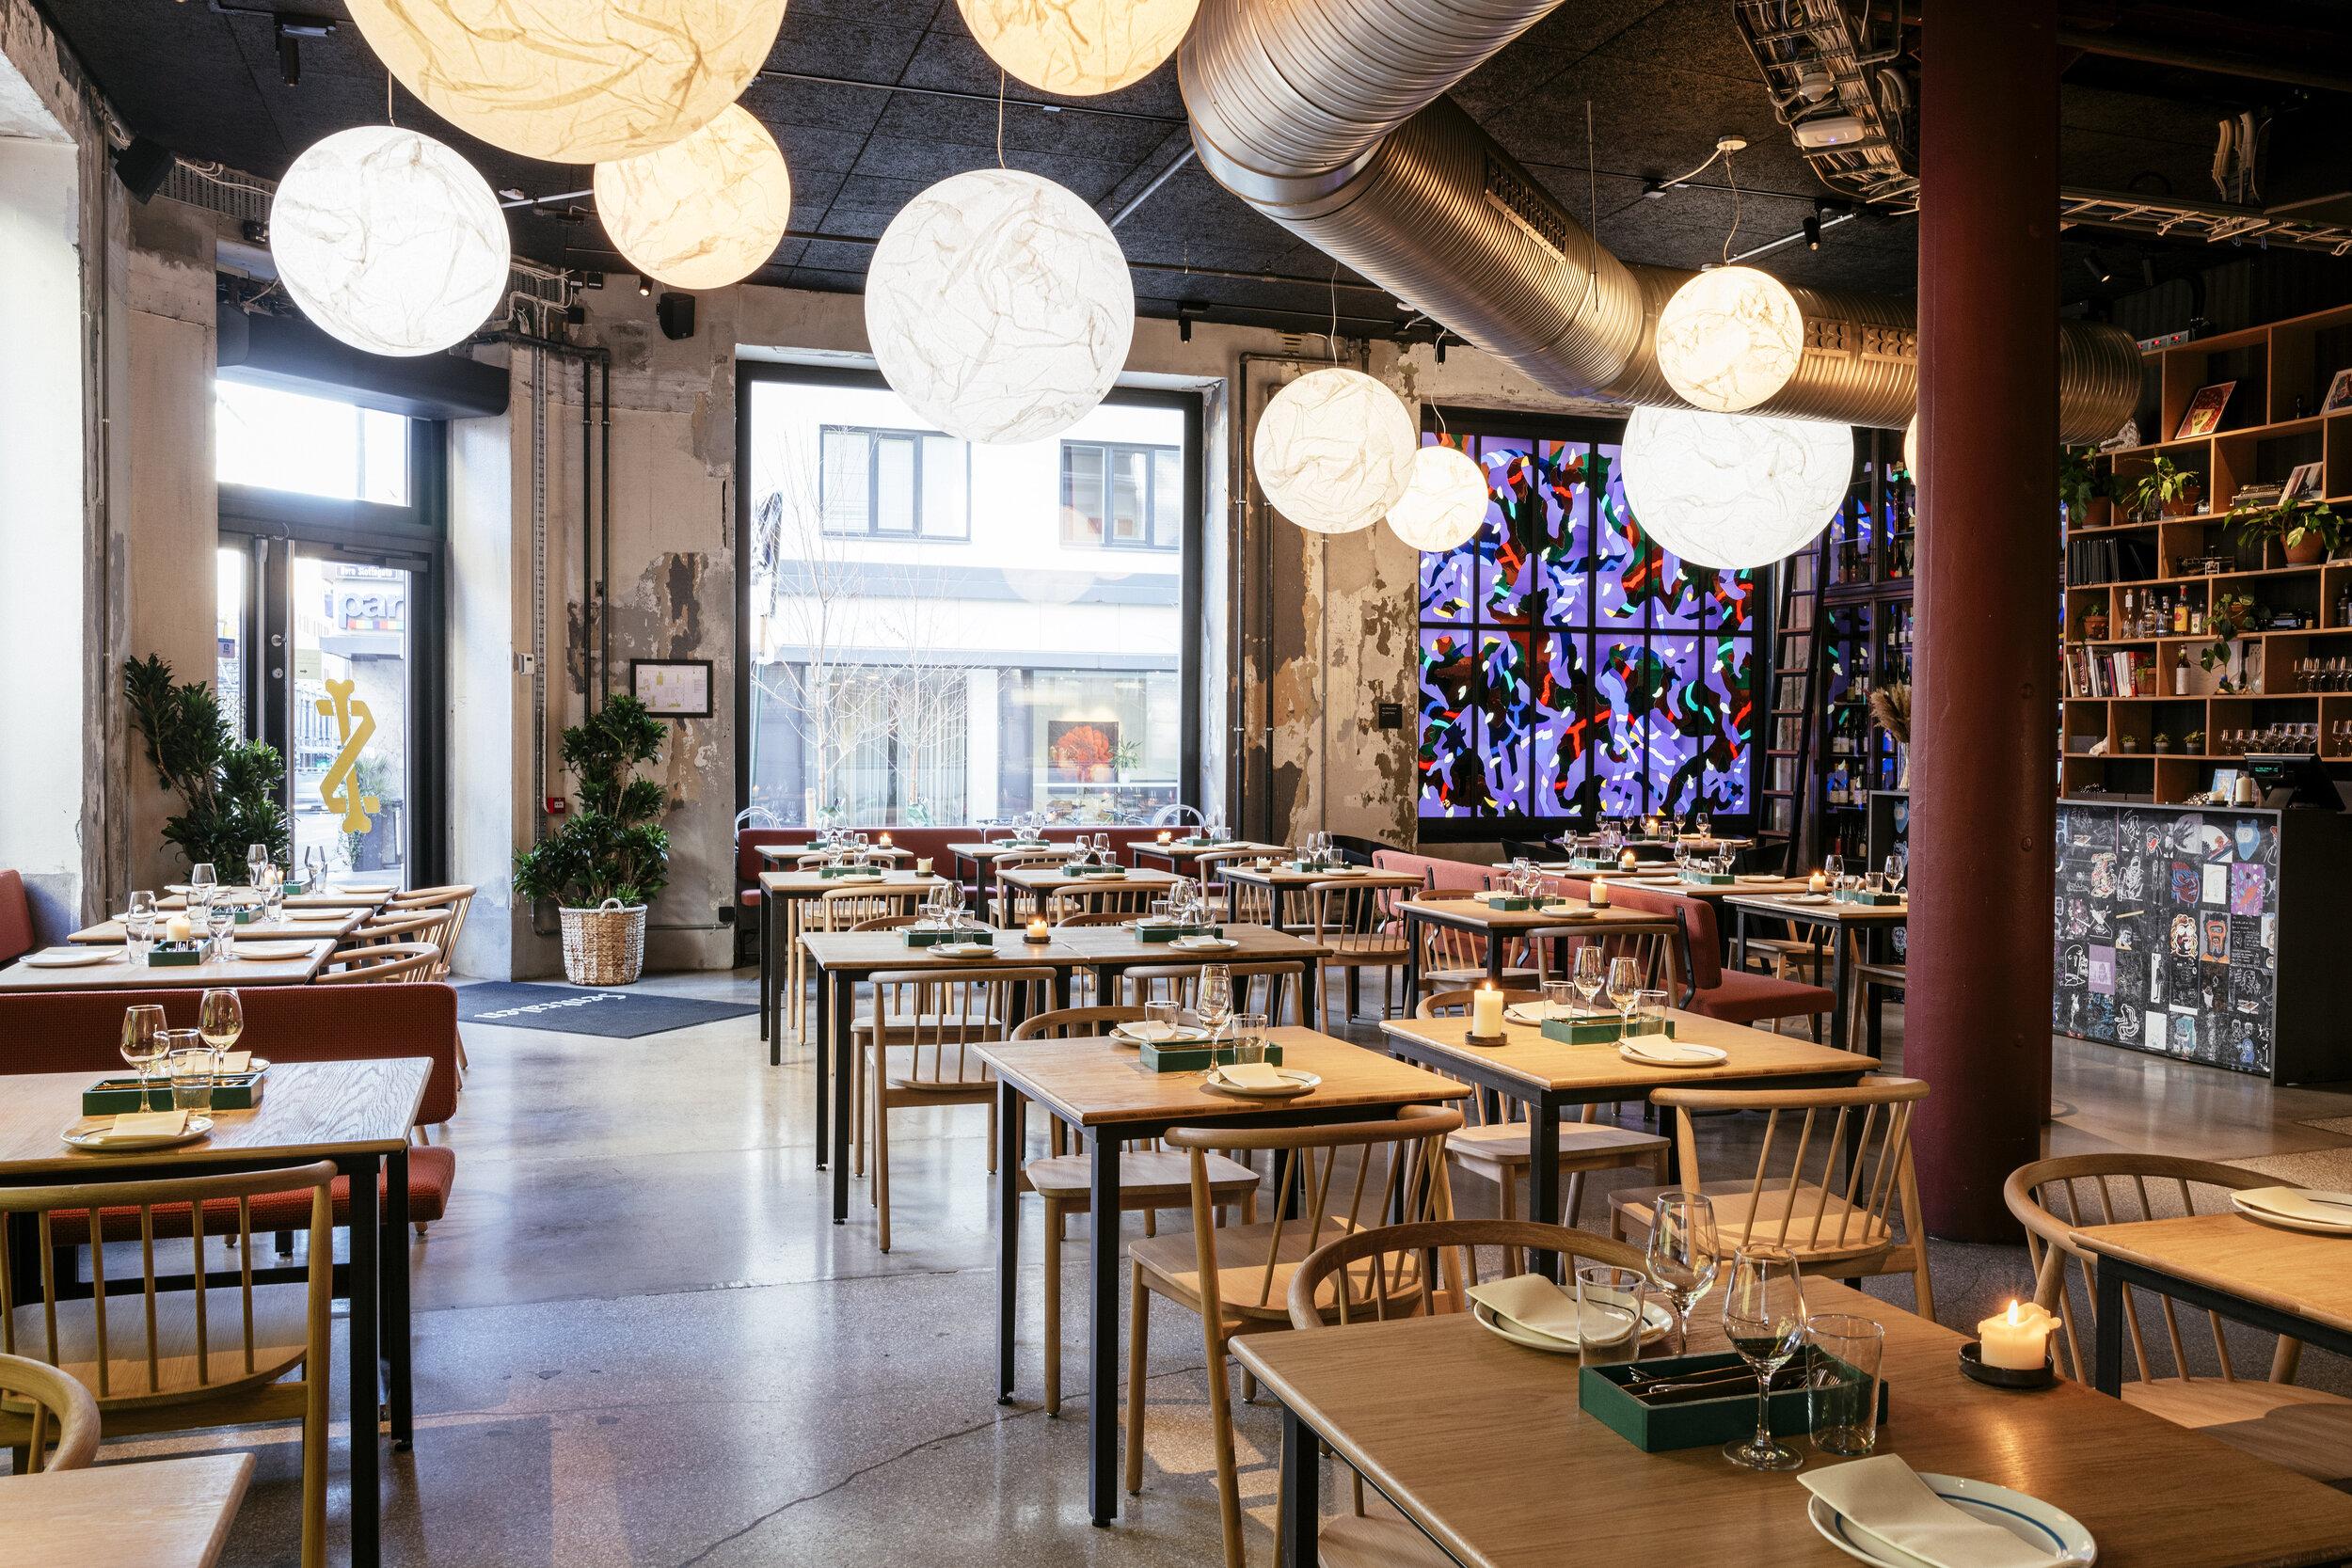 sentralen restaurant oslo